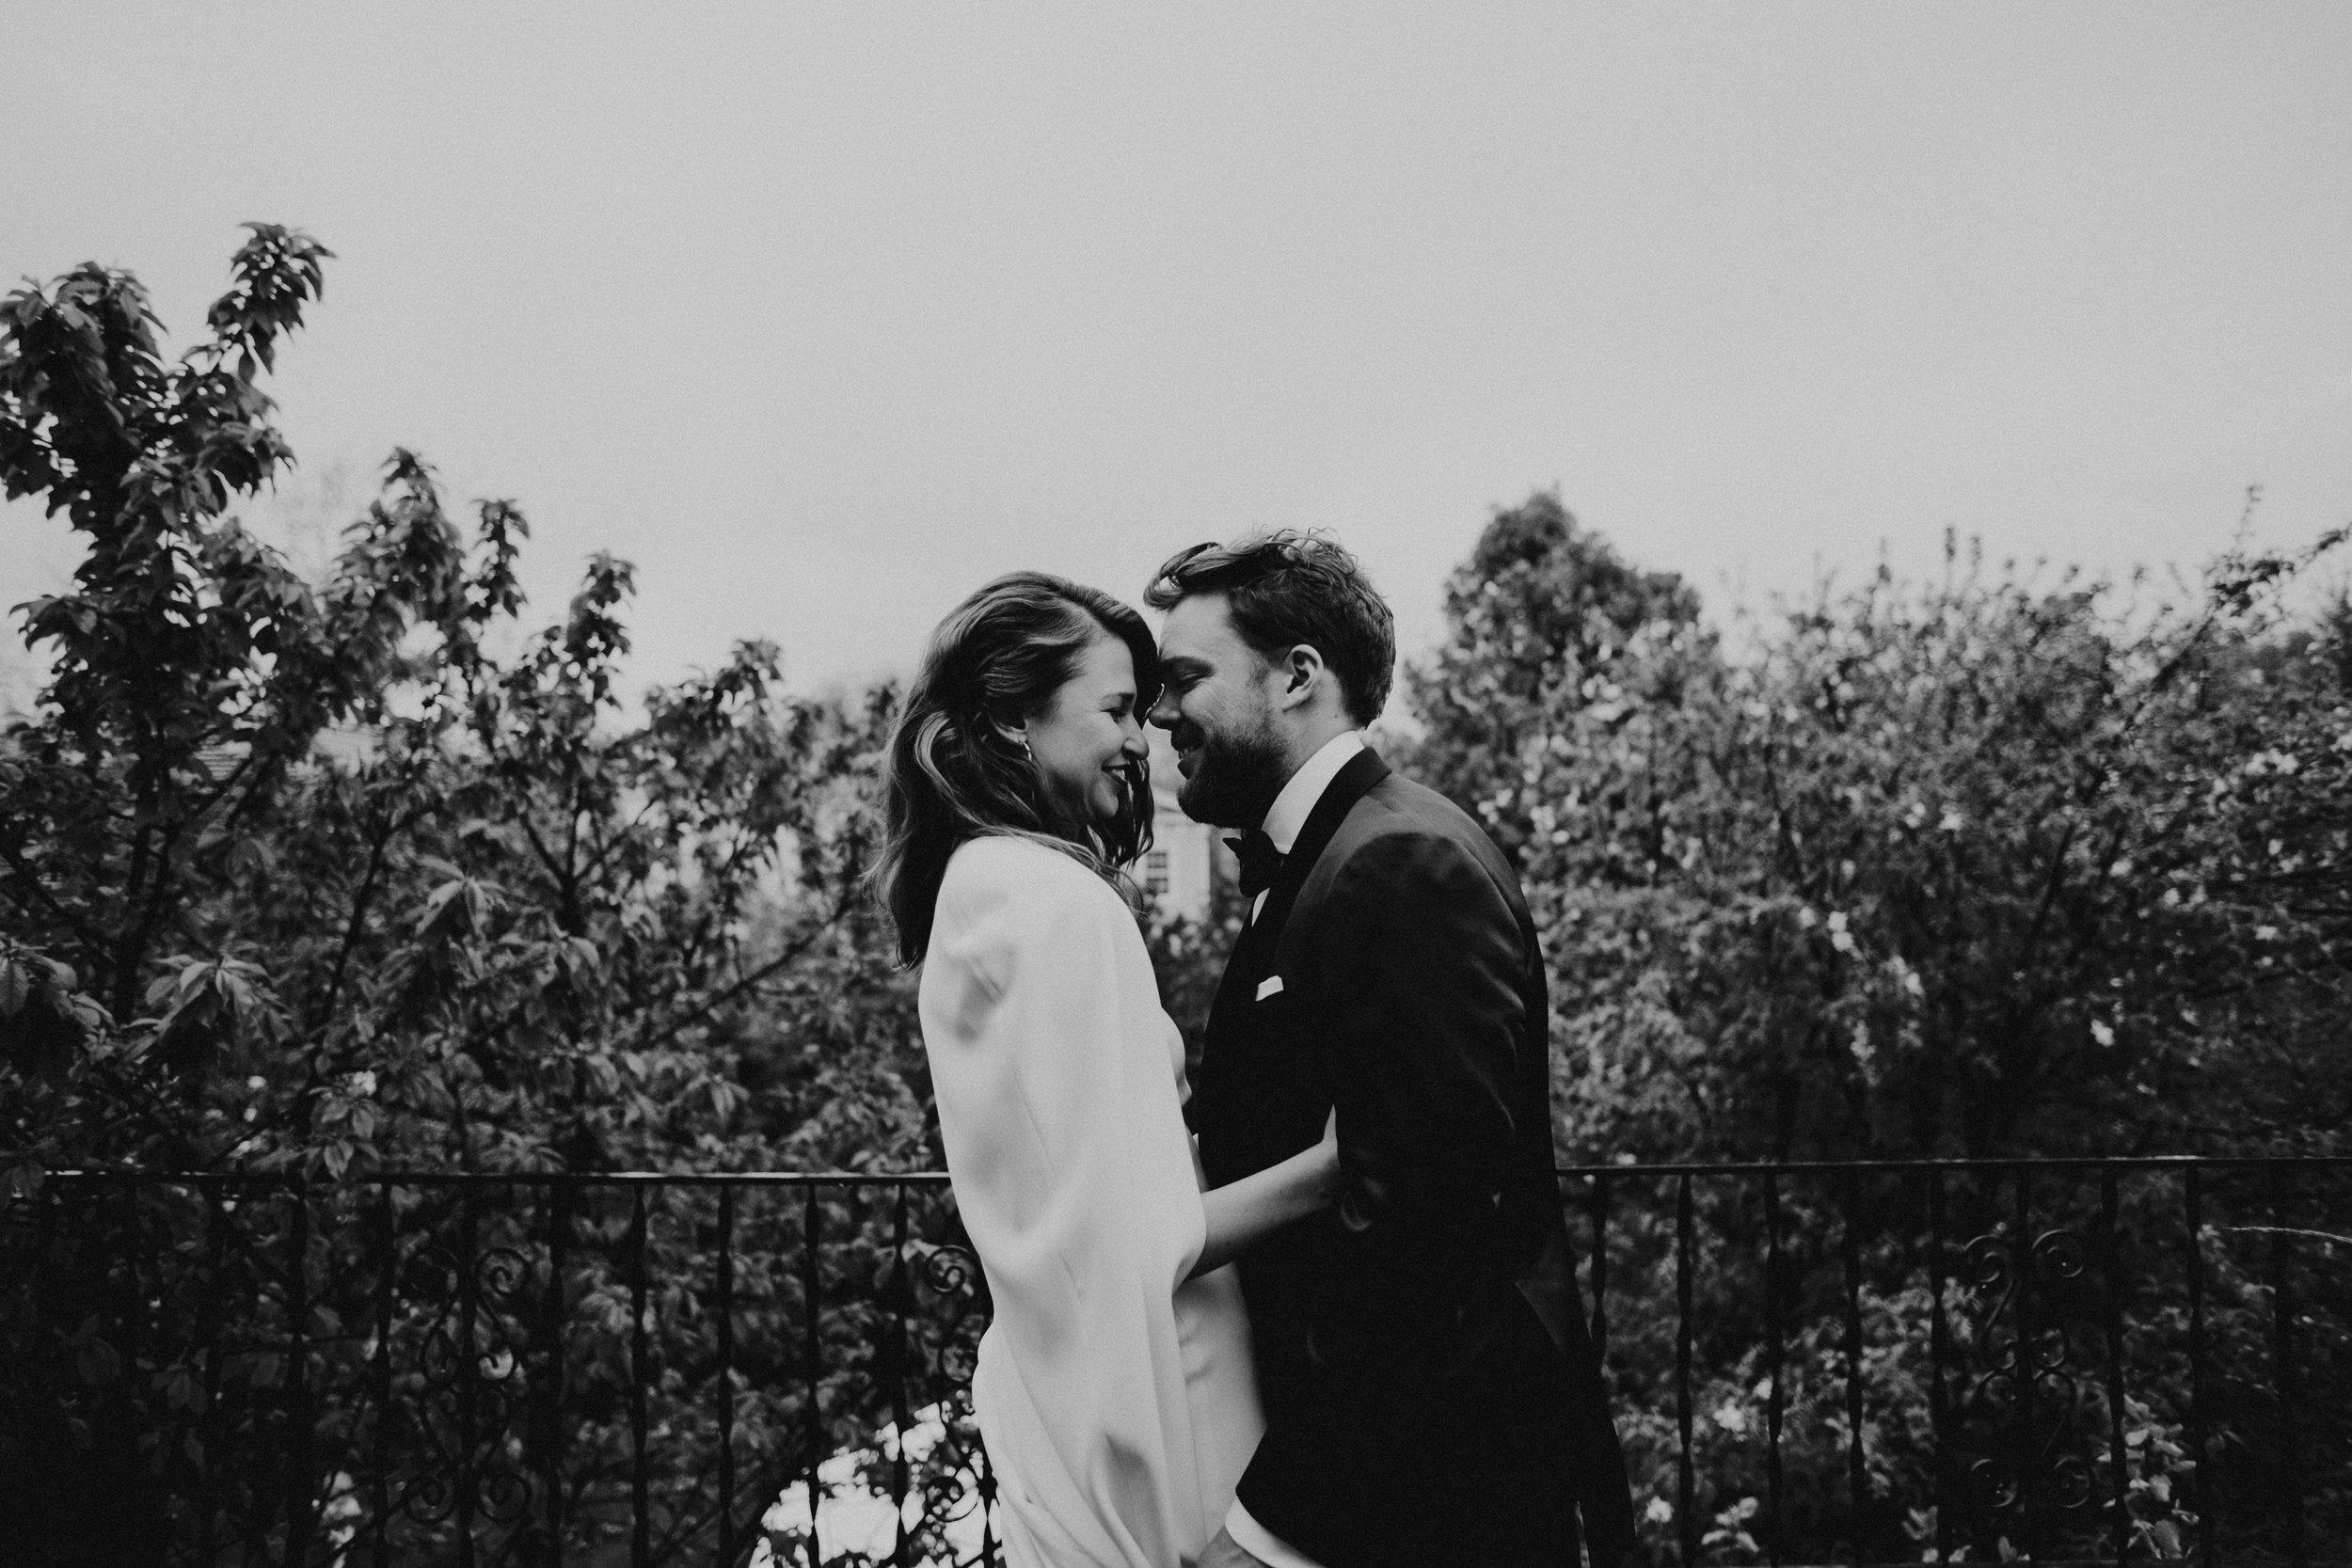 Tiger_House_The_Inn_at_Hudson-Wedding_Chellise_Michael_Photography-329.jpg